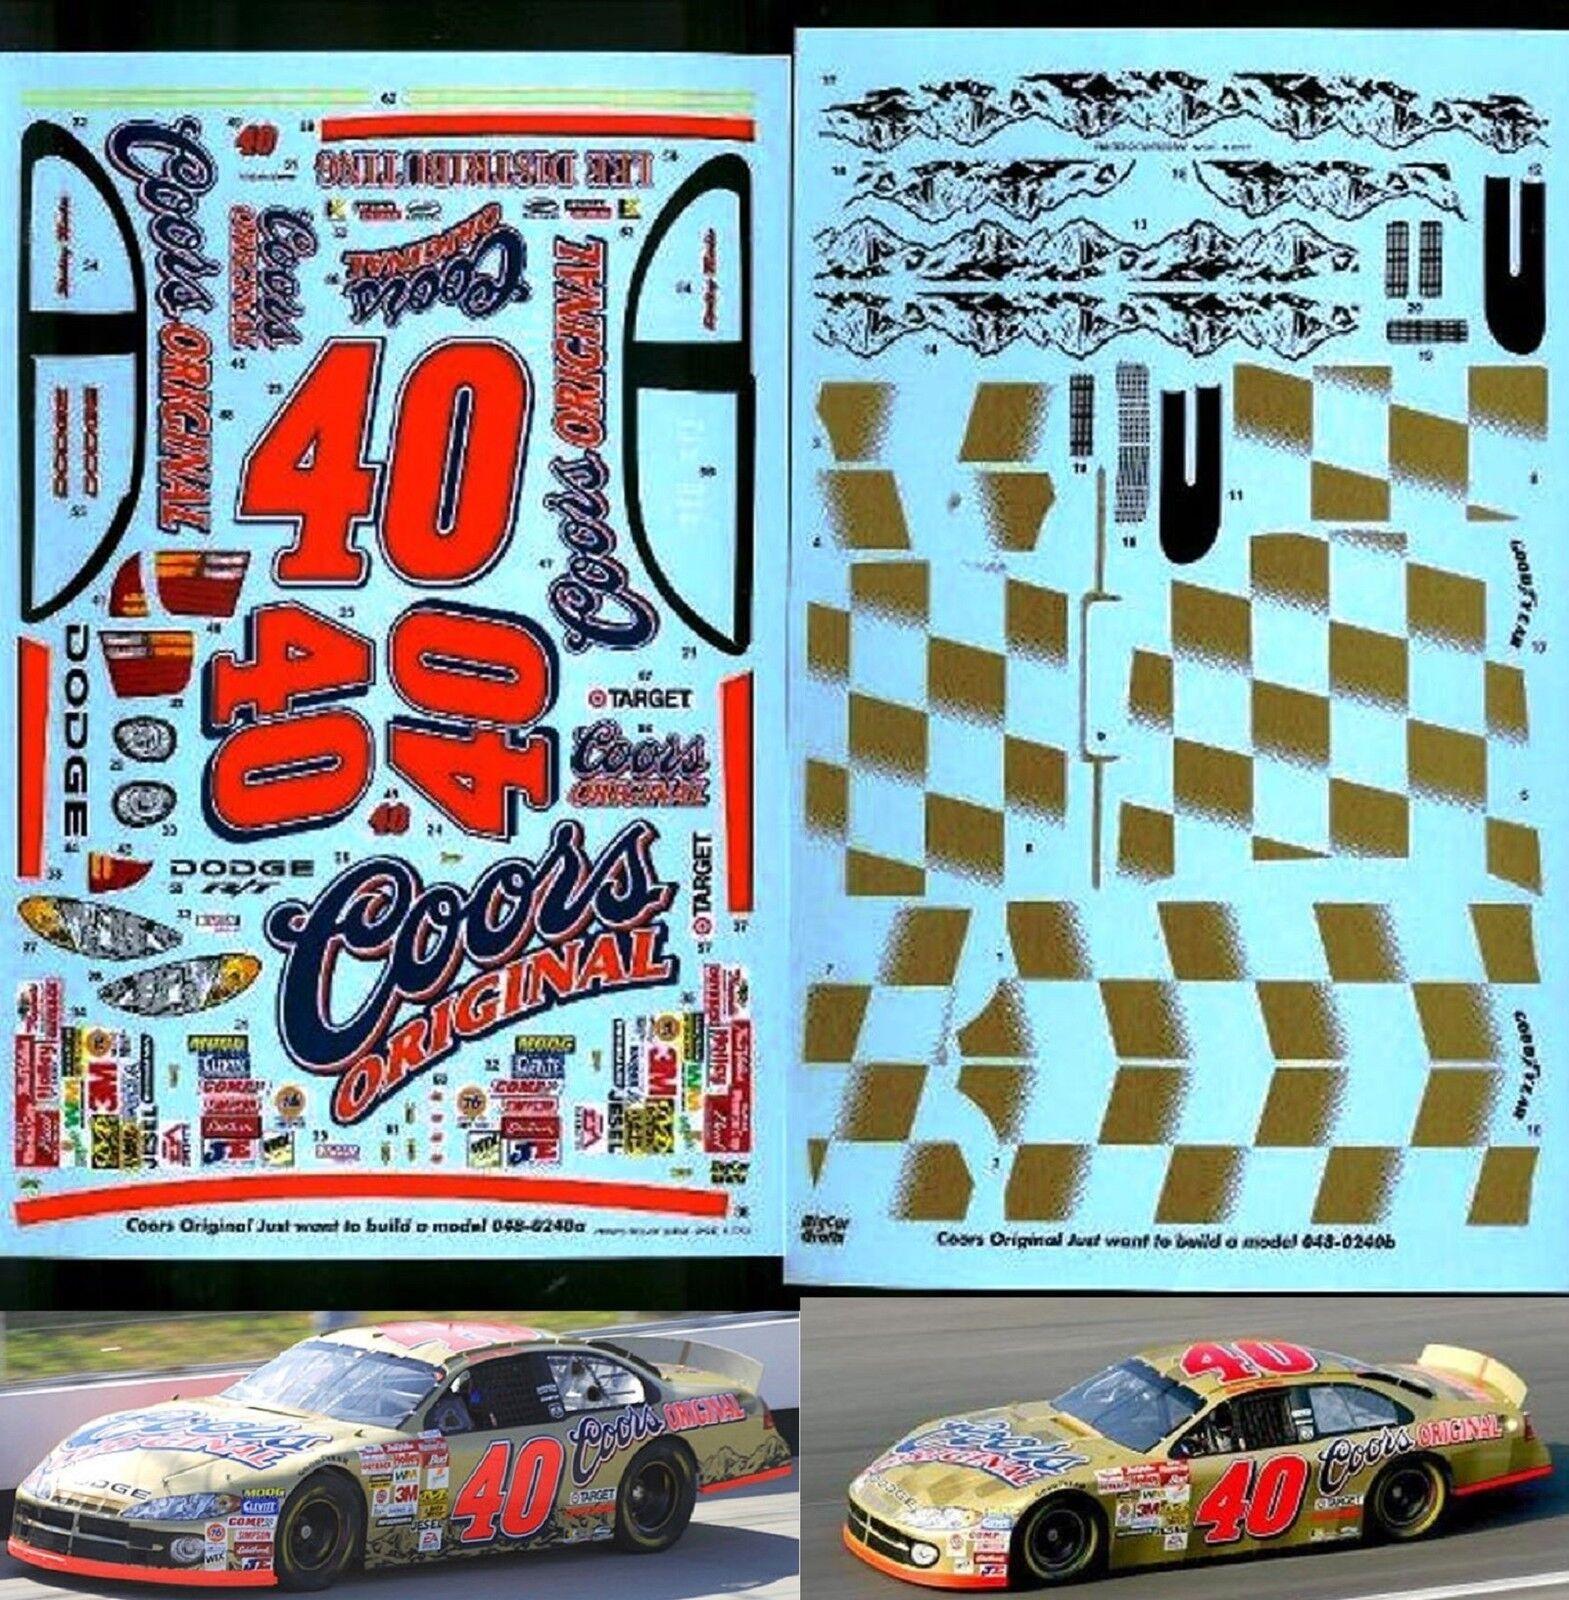 NASCAR DECAL COORS ORIGINAL gold 2002 DODGE - 2 VERSIONS - STERLING MARLIN